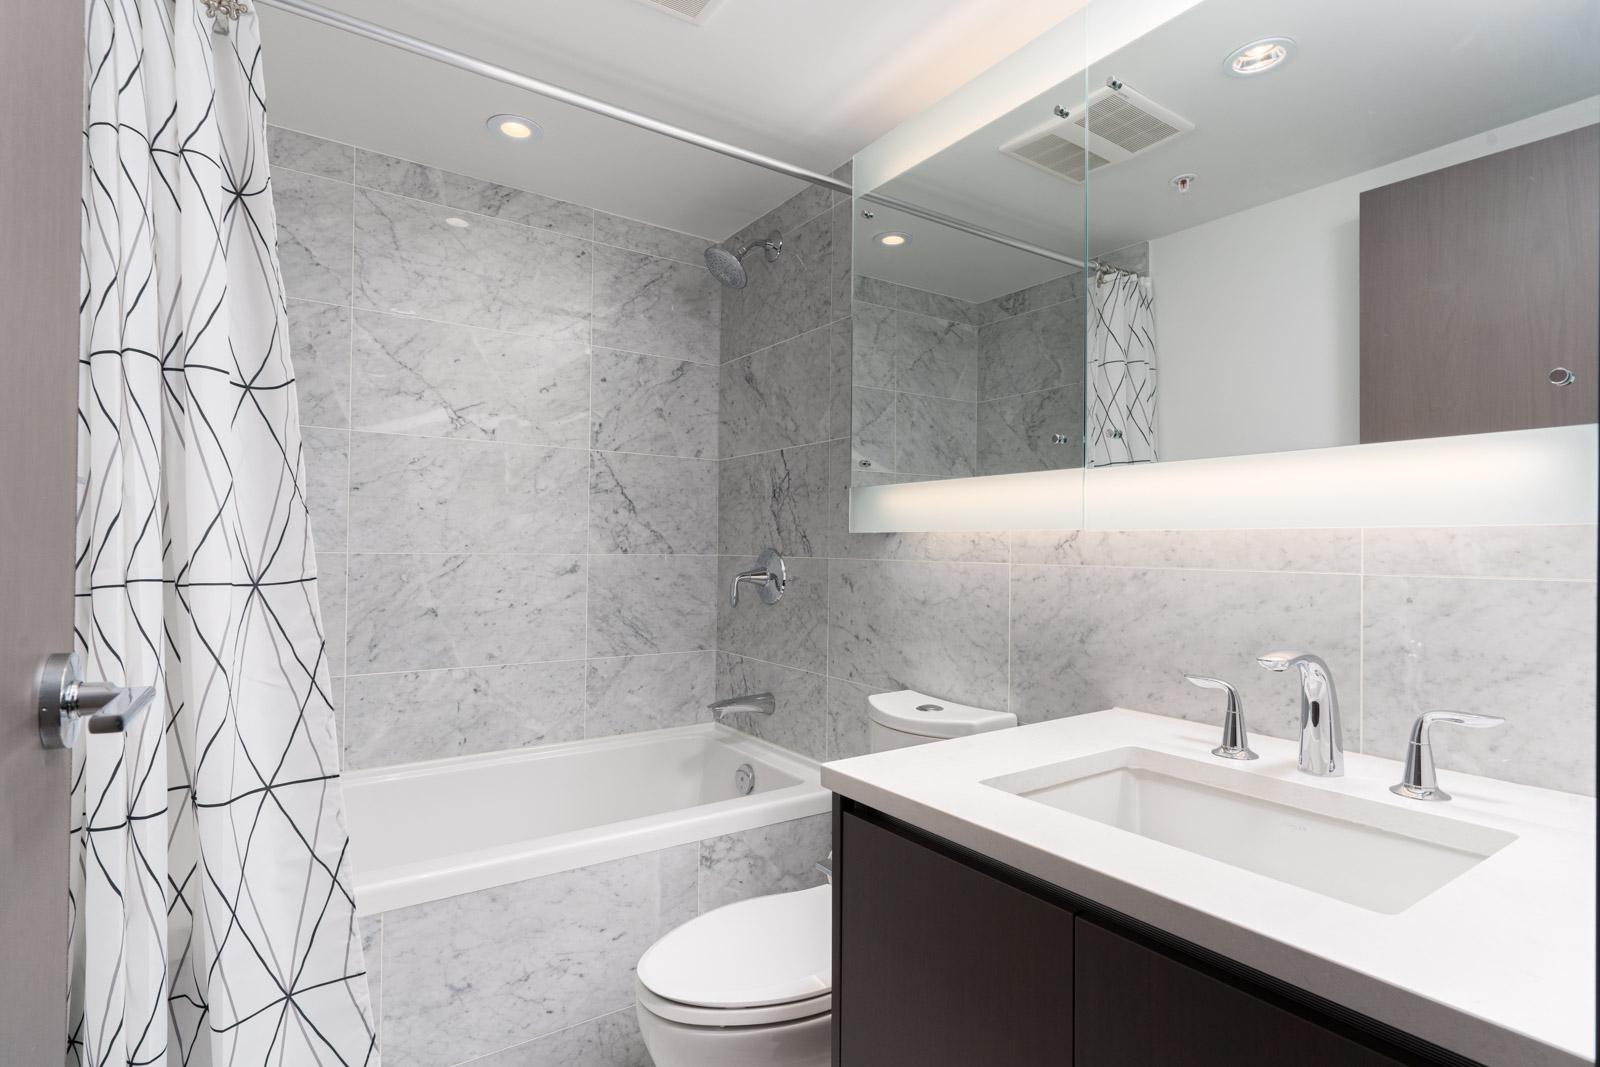 washroom with white sink and a bath tub in a rental condo in richmond